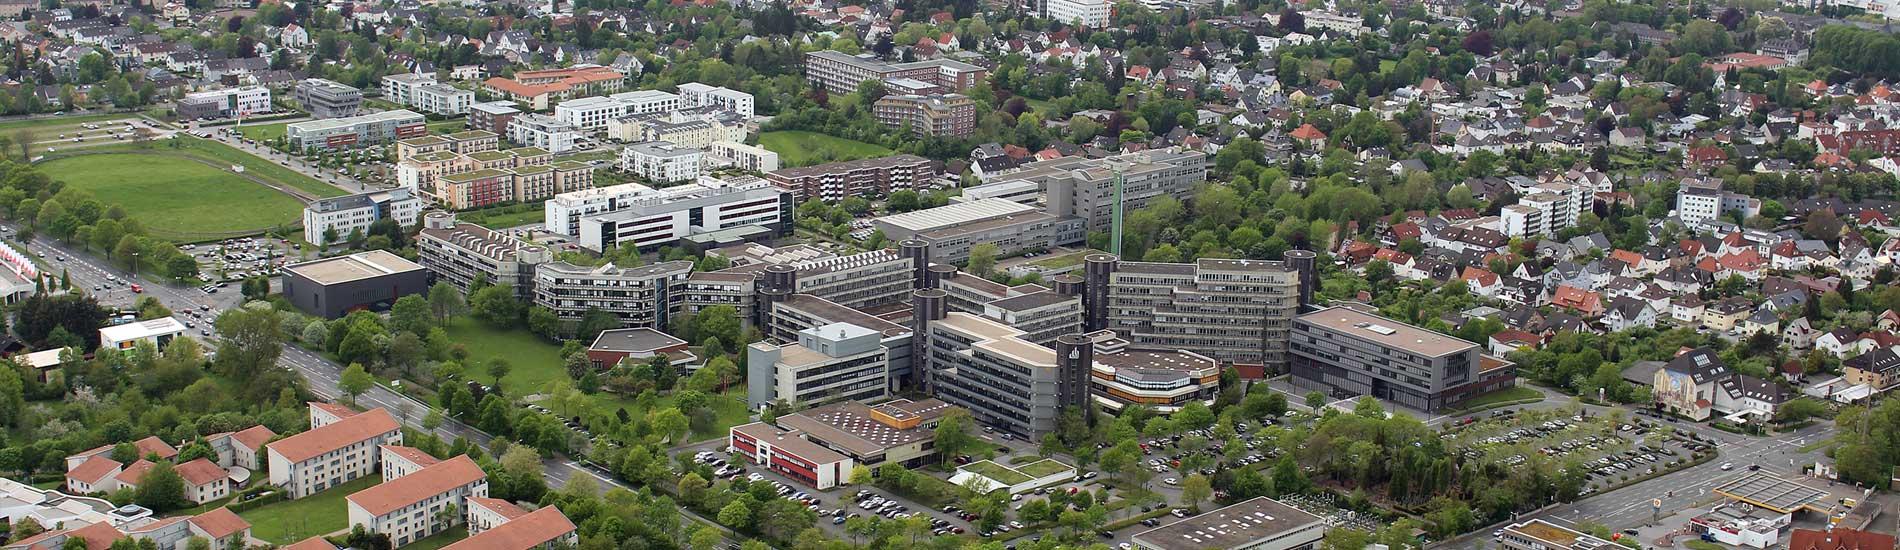 PaderbornGezi Rehberi